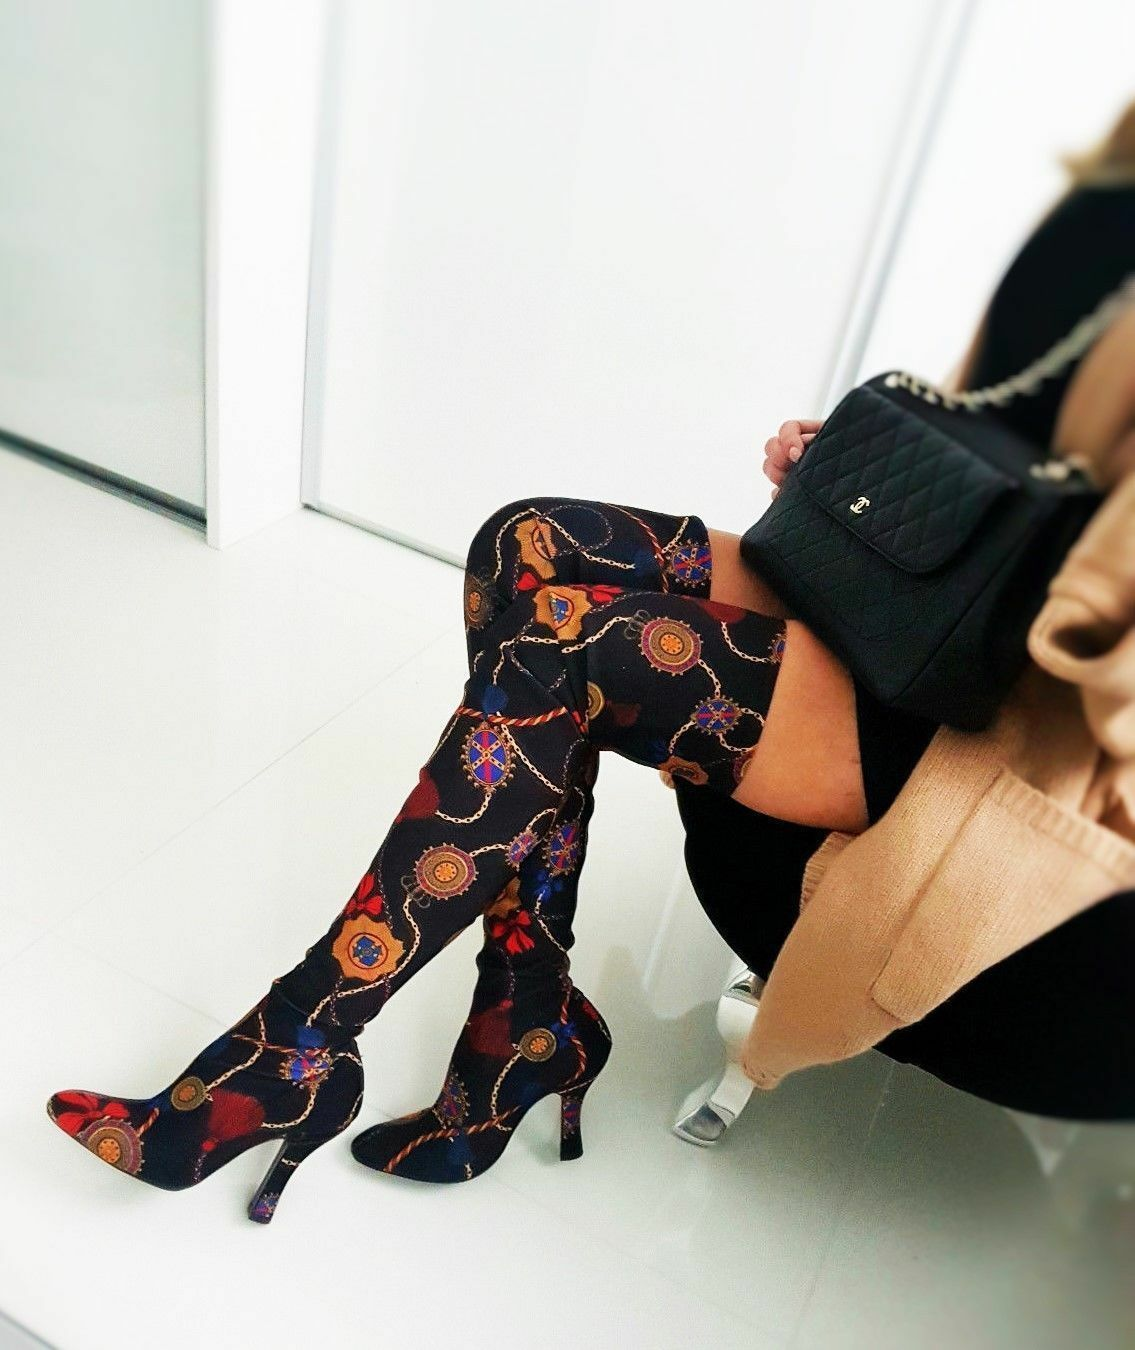 ZARA Woman BNWT Over The Knee High Heel Boots With Printed Fabric EU38 5013 201